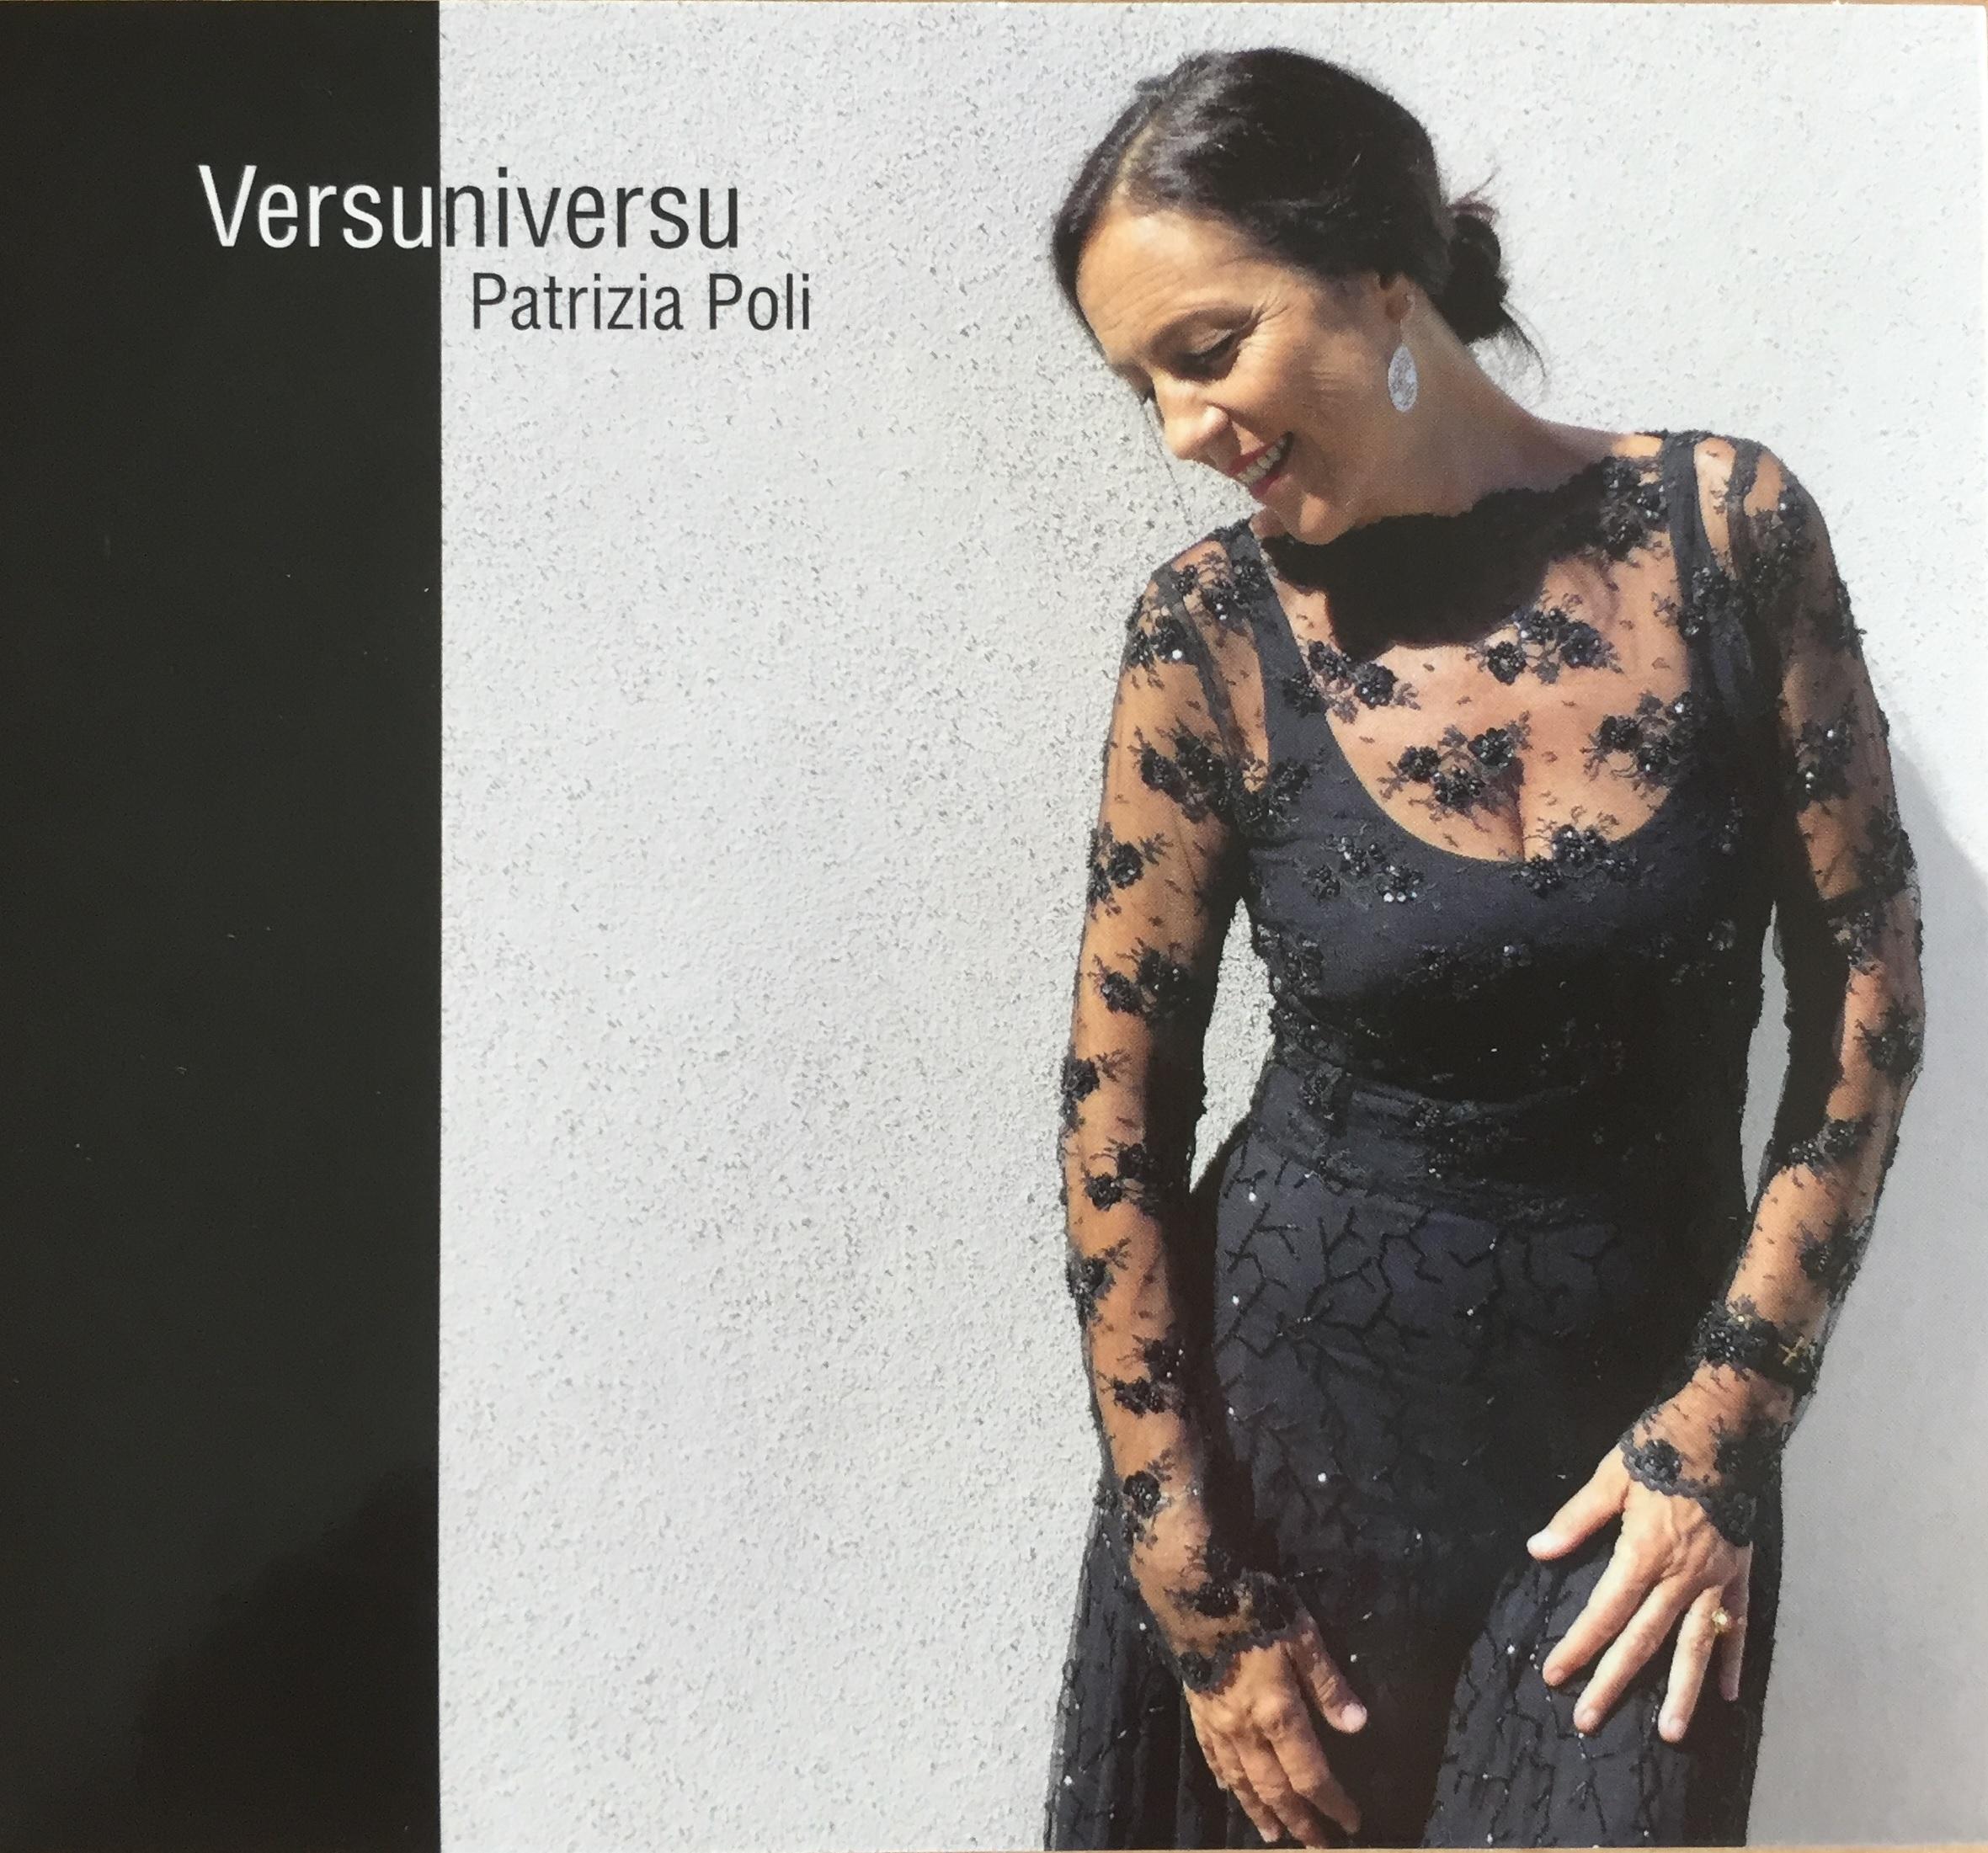 Musique : «Versuniversu », le nouveau disque de Patrizia Poli